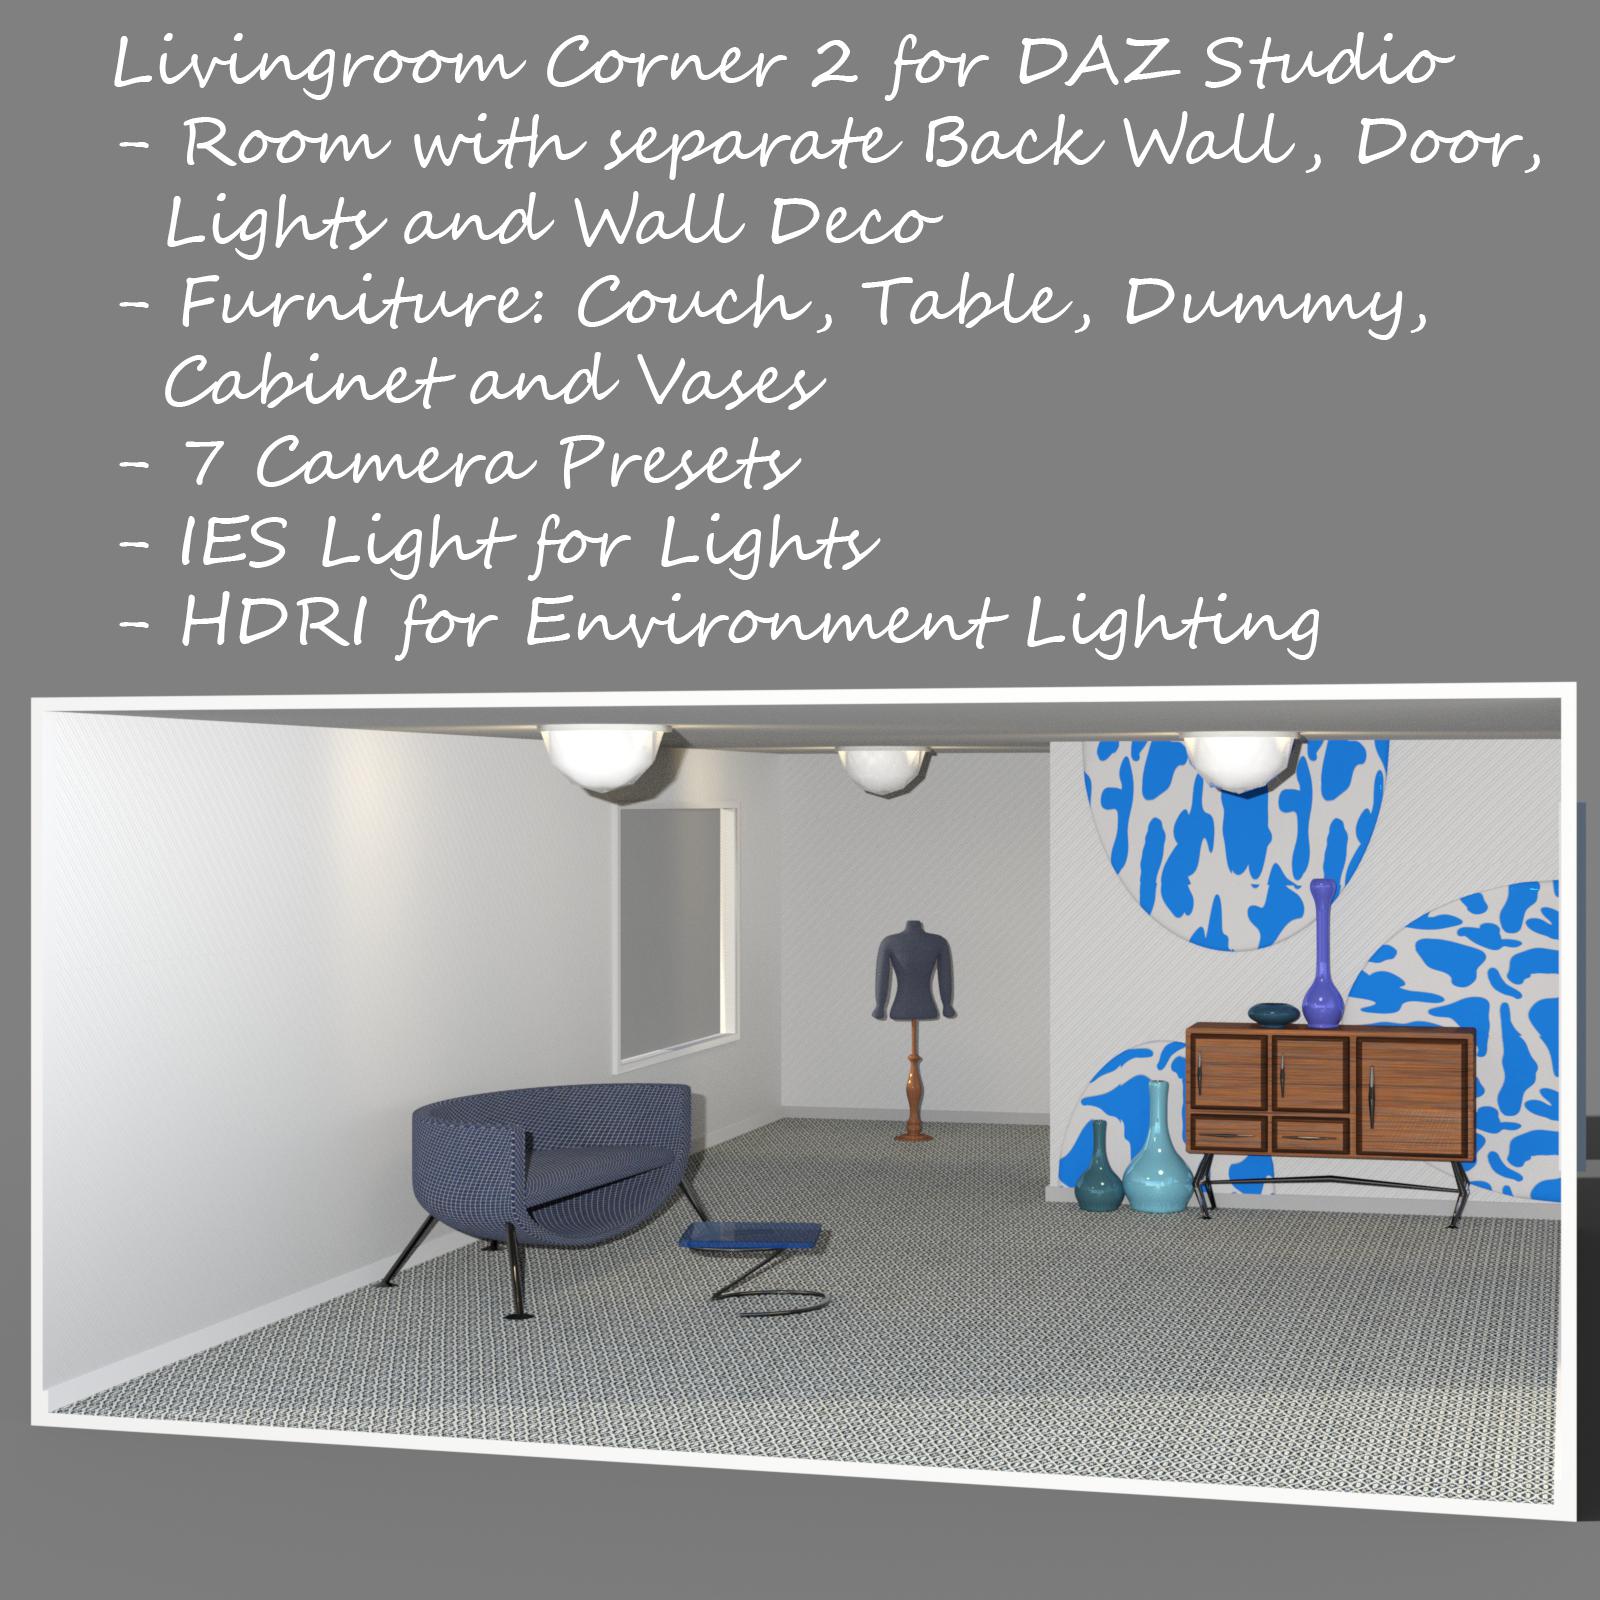 Livingroom Corner 2